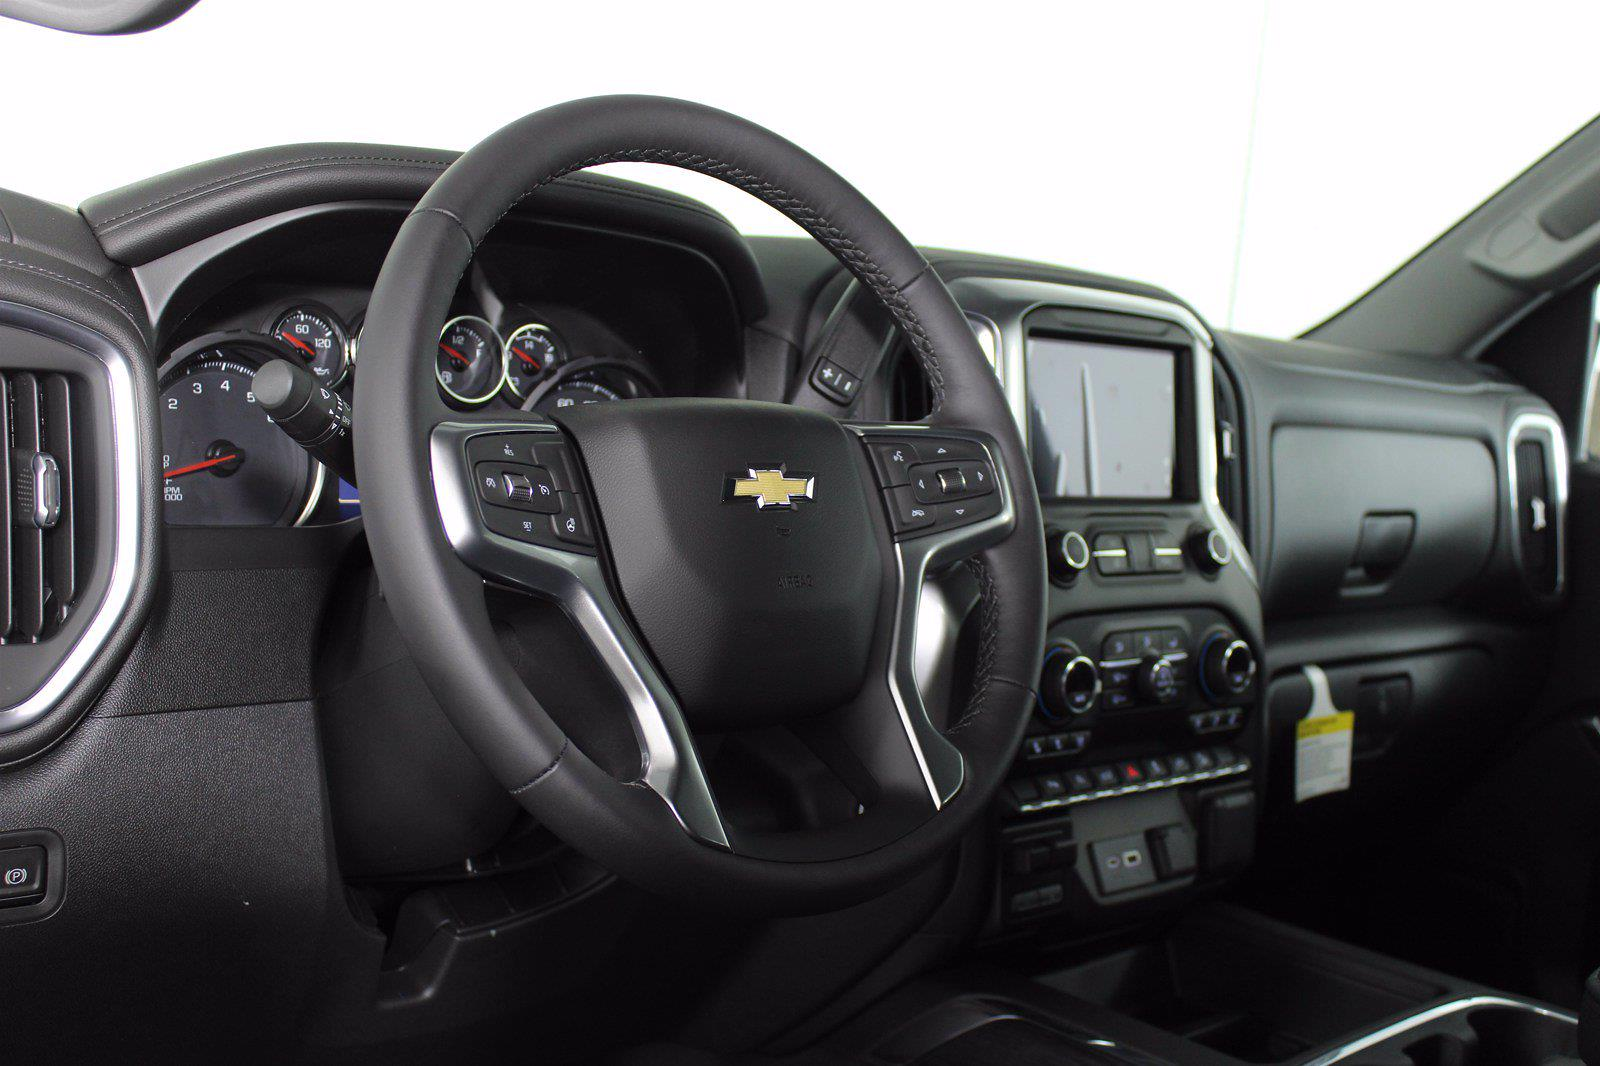 2021 Chevrolet Silverado 1500 Crew Cab 4x4, Pickup #D111157 - photo 10